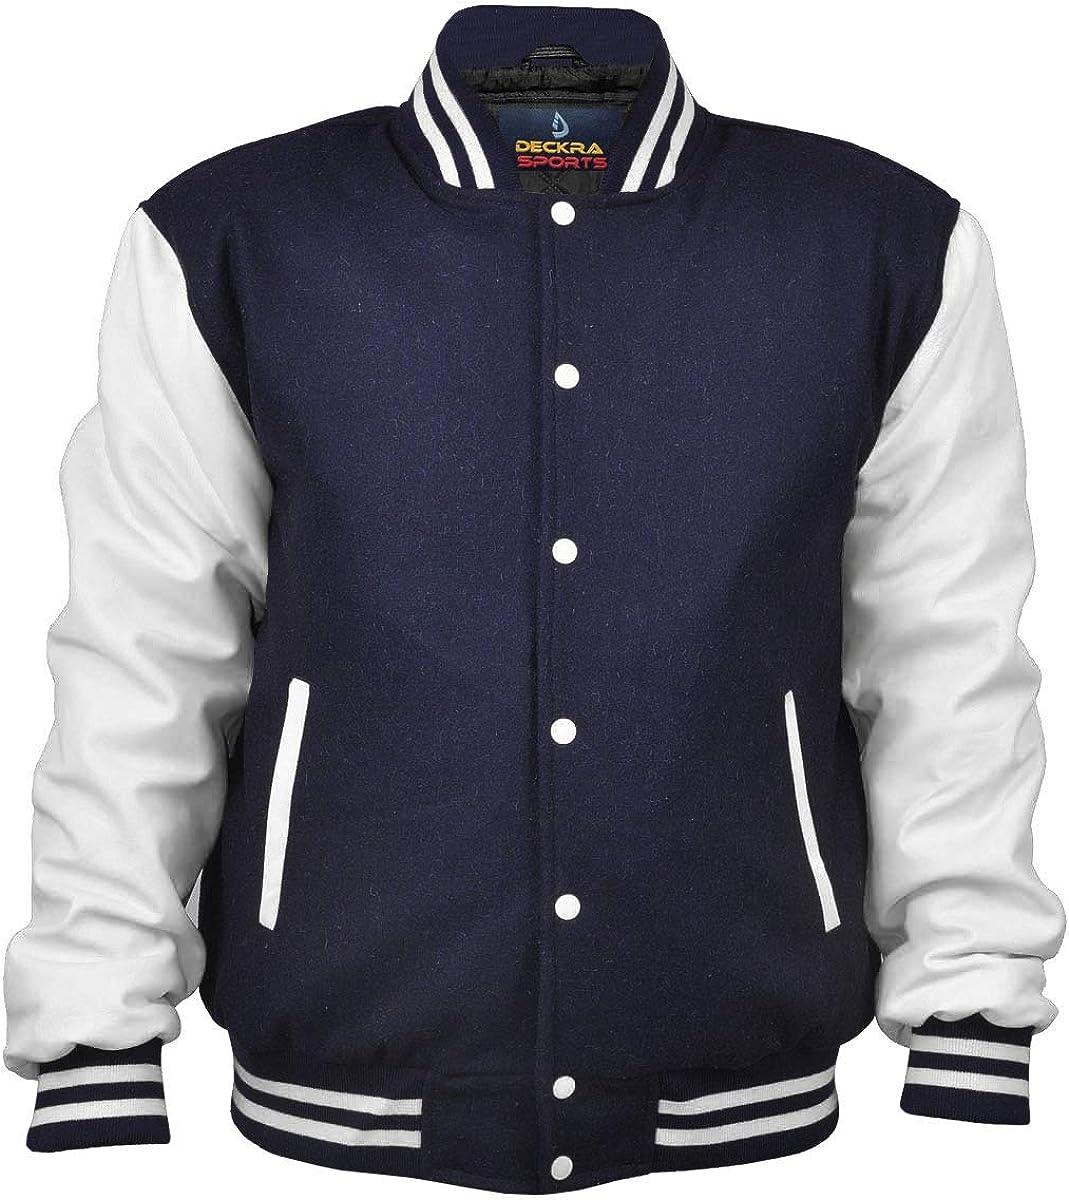 Men's Varsity Jacket Genuine Leather Sleeve and Wool Blend Letterman Boys College Varsity Jackets XXS-5XL (Navy Blue-White, Small)